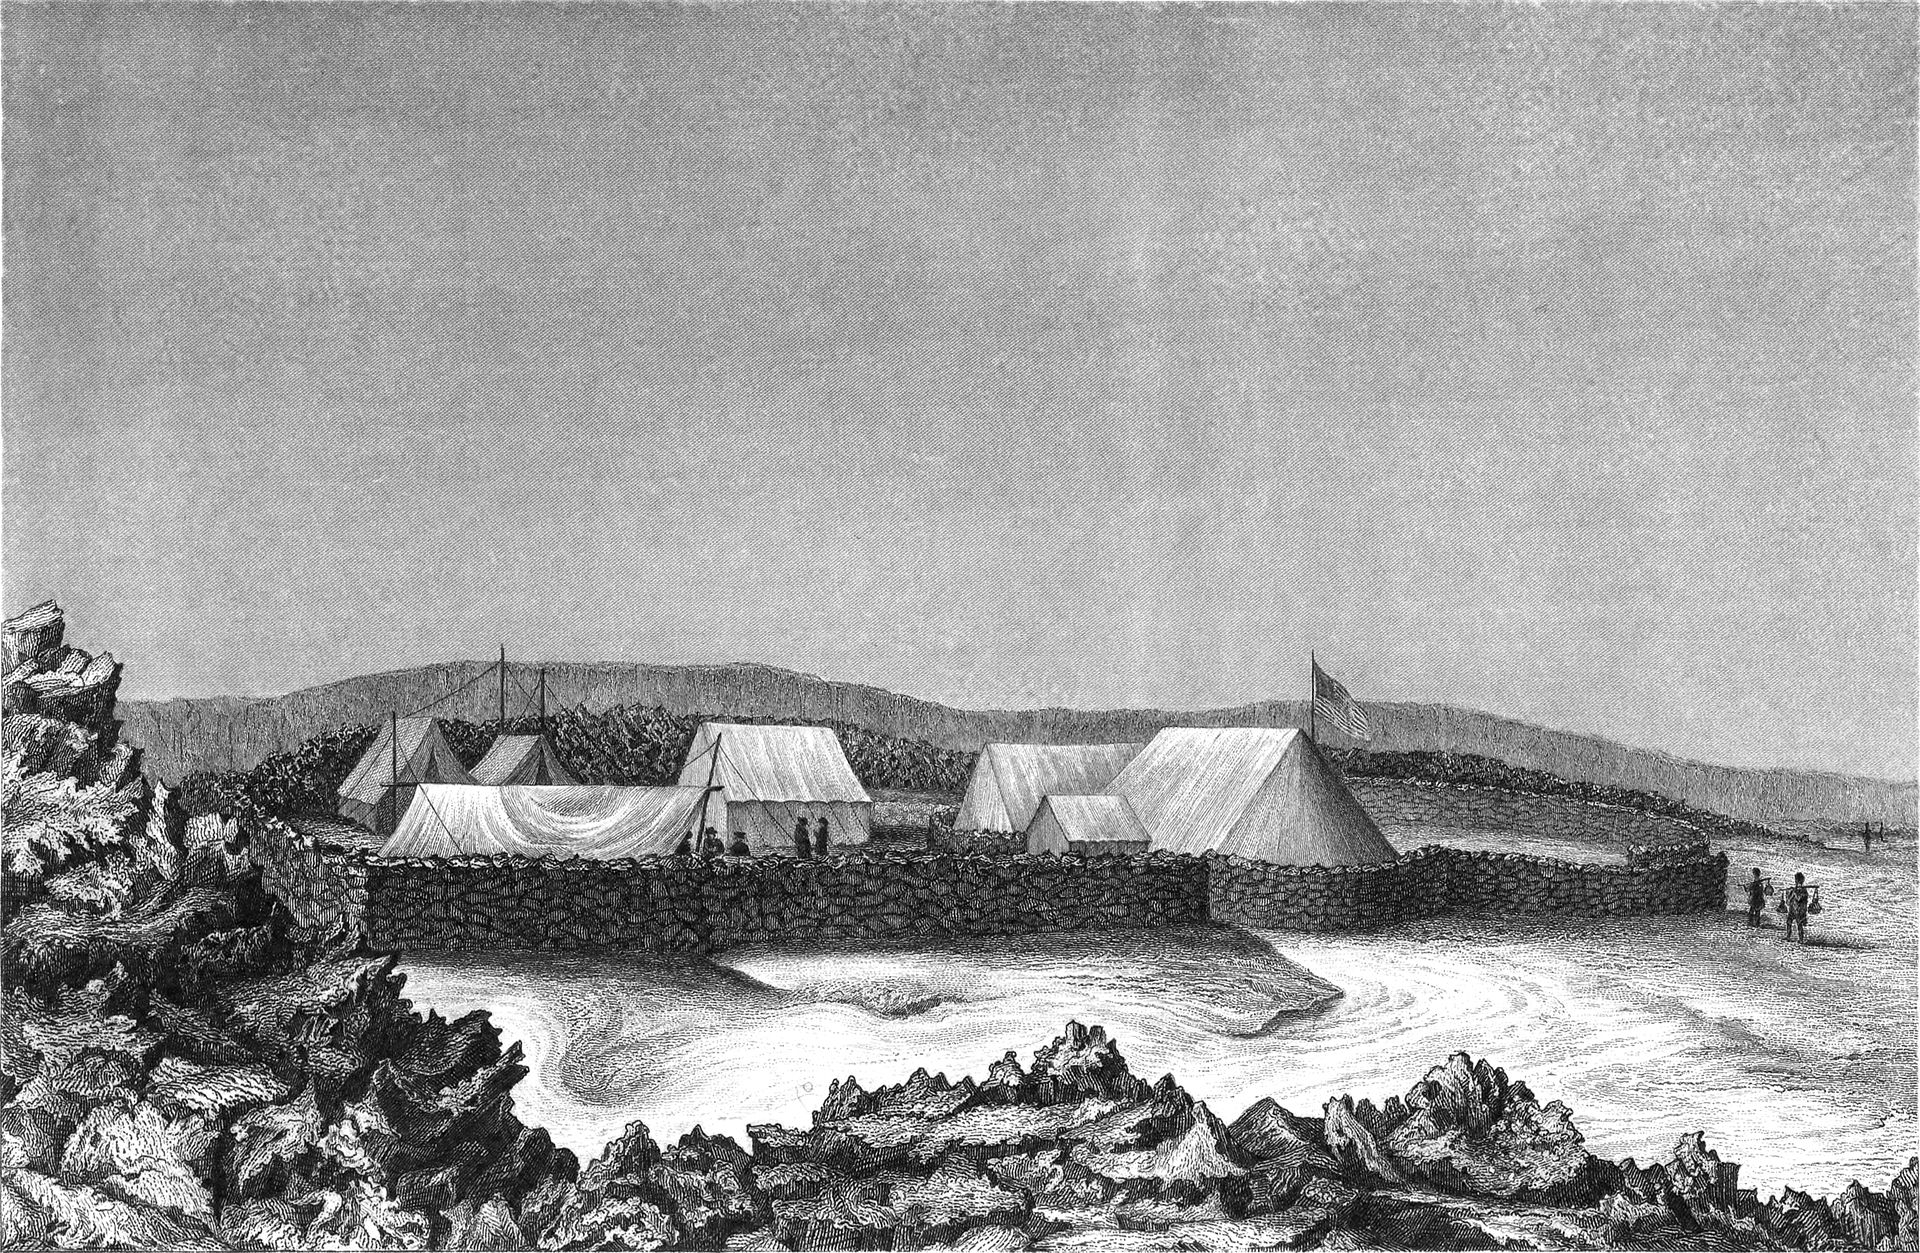 Sketch of the campsite